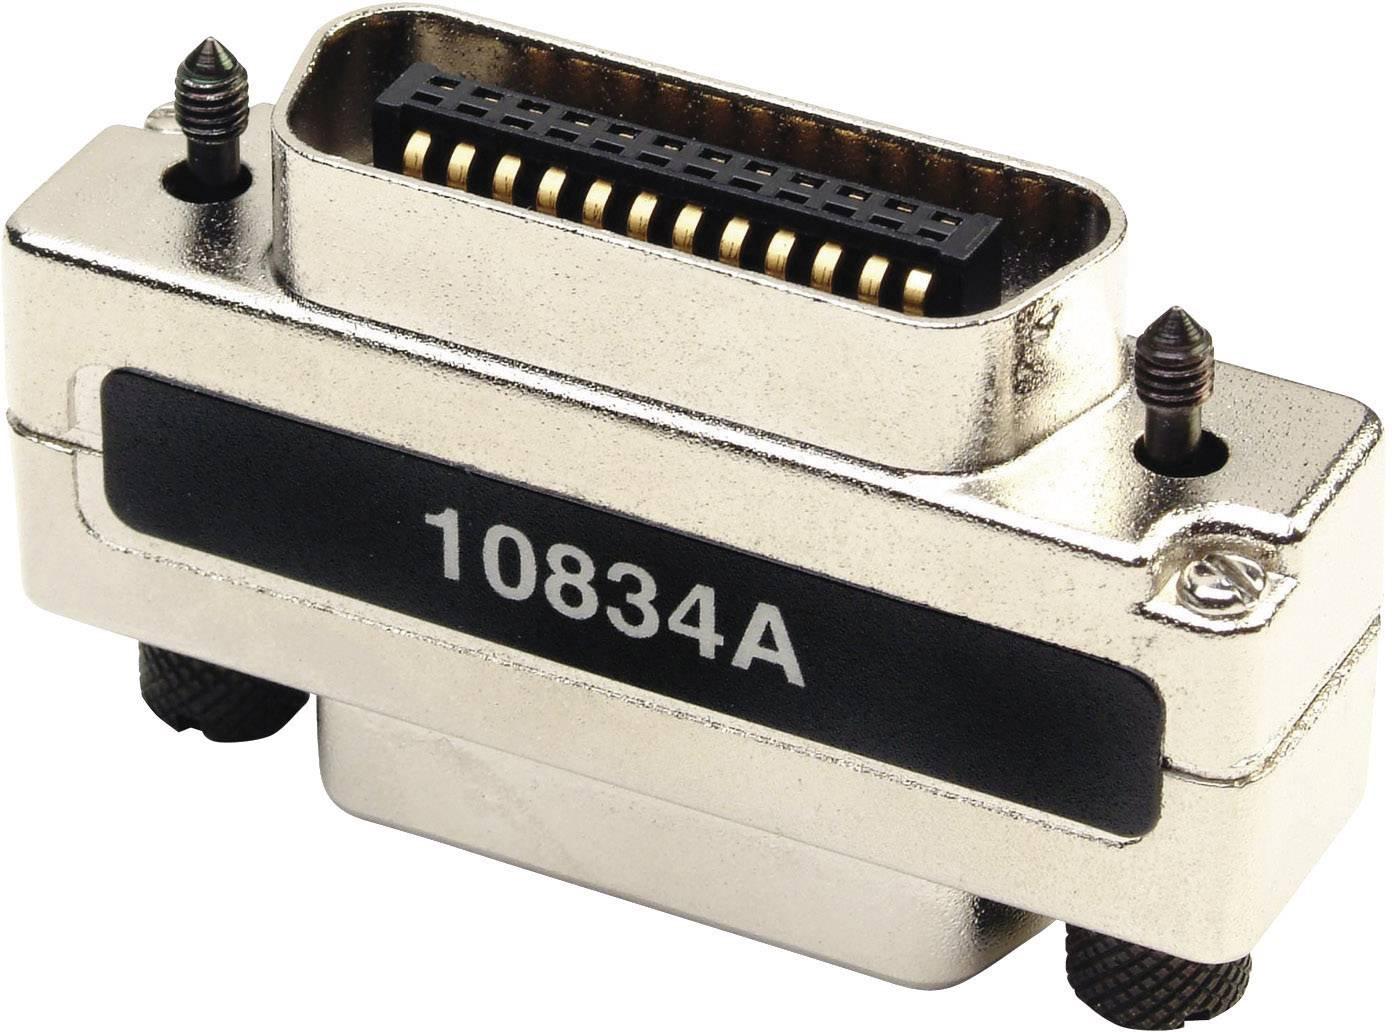 GPIB/GPIB adaptér Agilent Technologies, 10834A